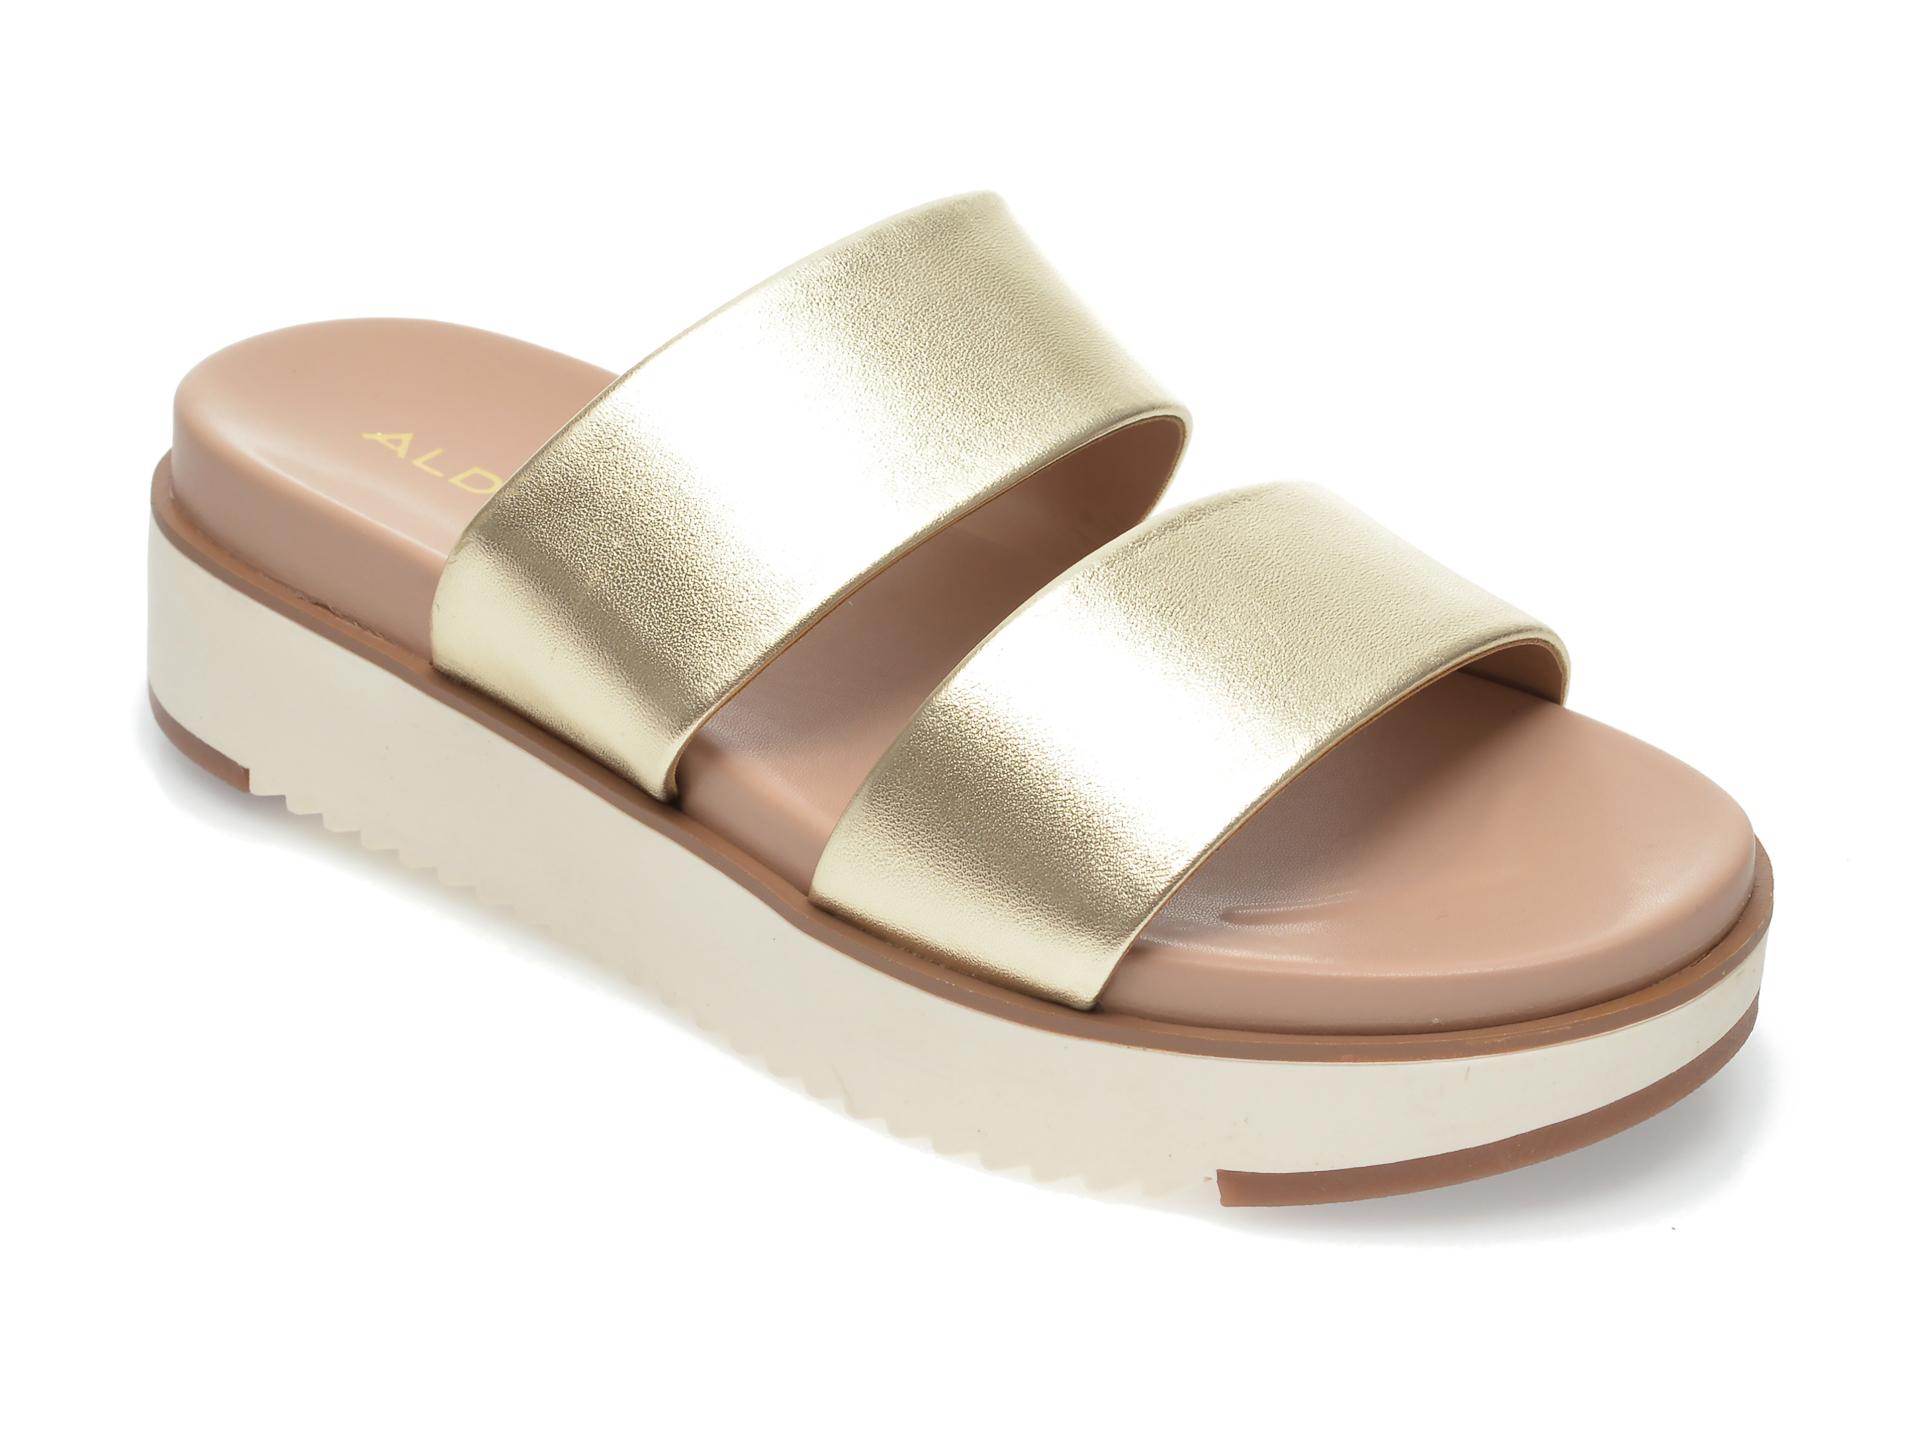 Papuci ALDO aurii, Vicet710, din piele naturala imagine otter.ro